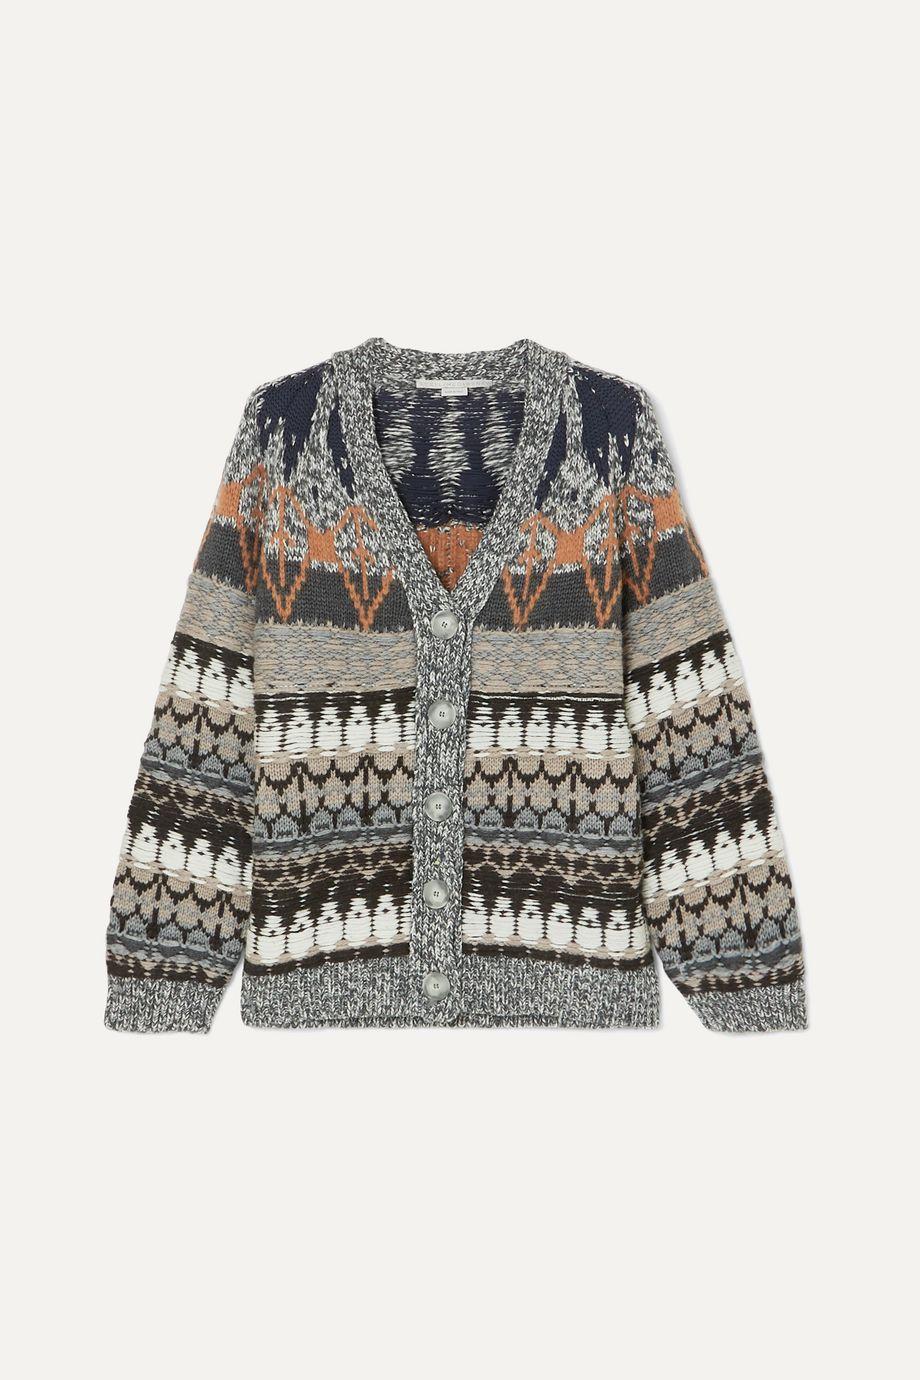 Stella McCartney 羊毛混纺提花开襟衫